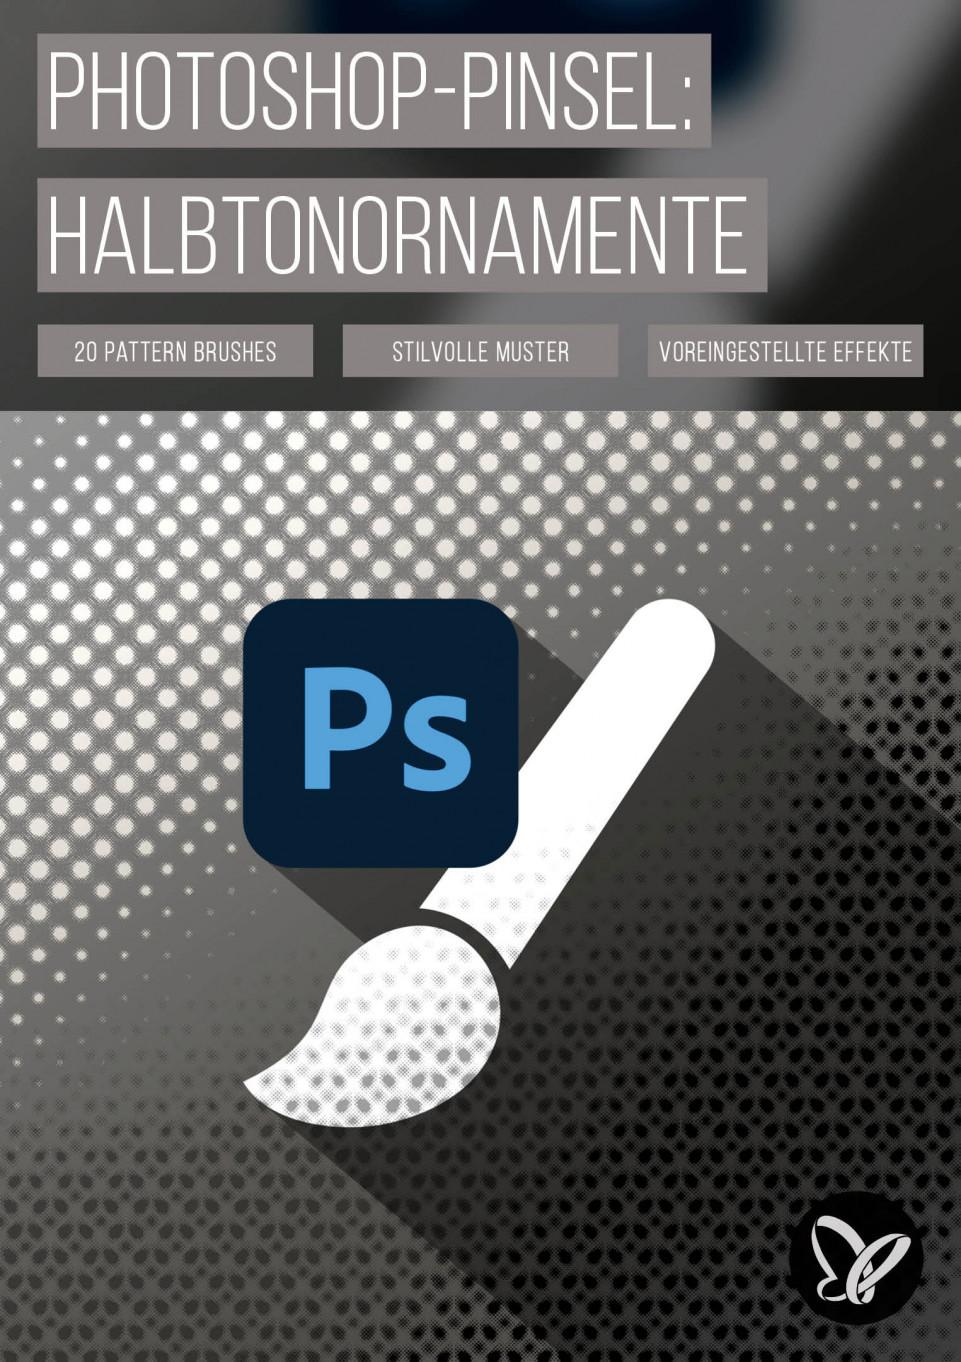 Pattern Brushes: 20 Photoshop-Pinsel für stilvolle Ornament-Muster